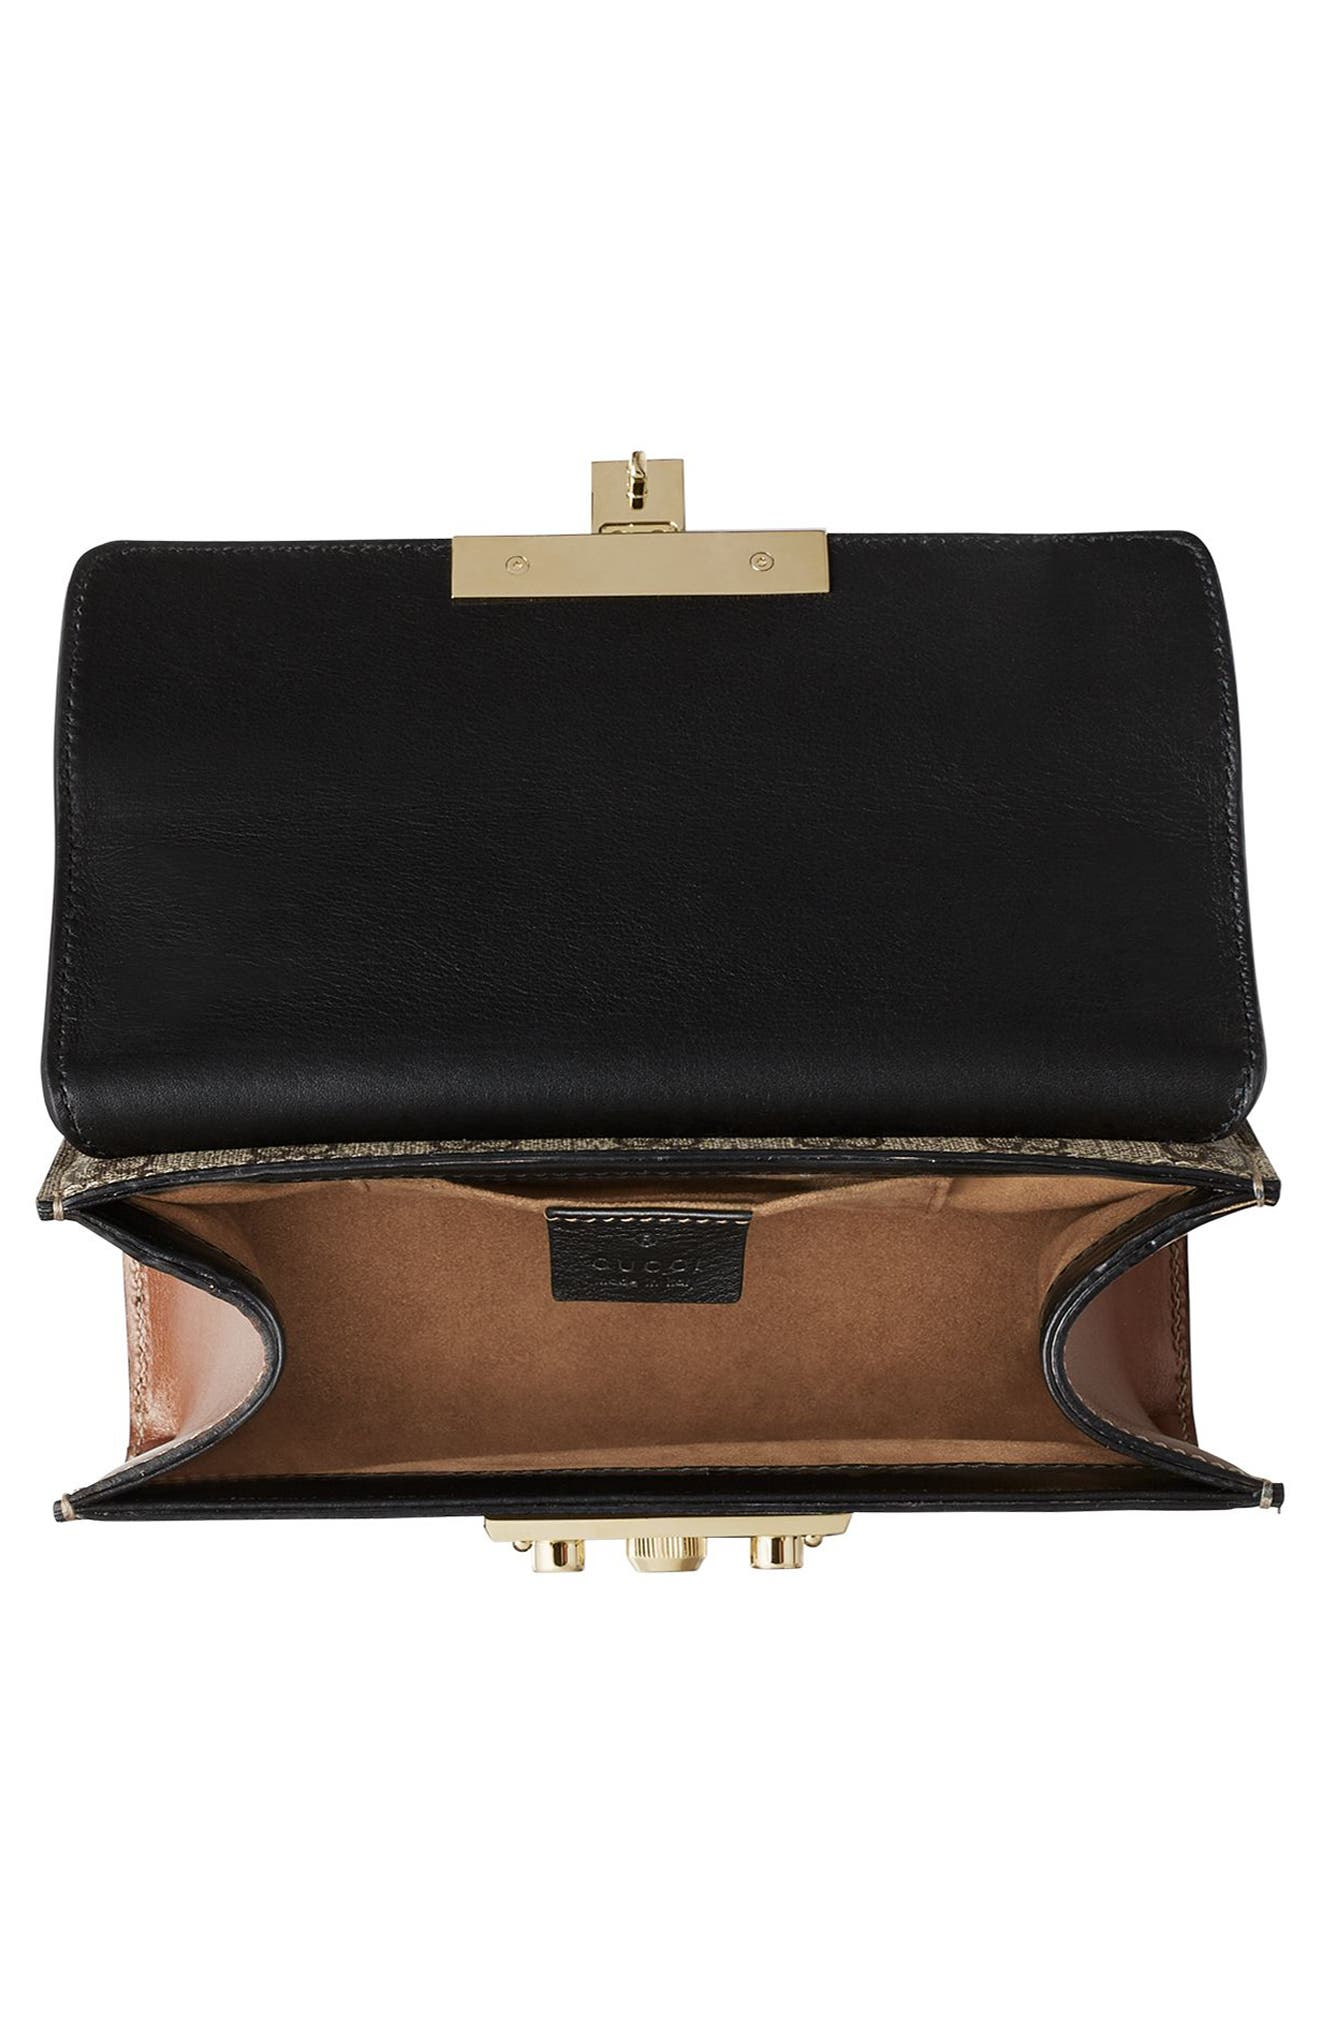 GUCCI, Small Padlock GG Supreme Canvas & Leather Shoulder Bag, Alternate thumbnail 3, color, MOON/TOSCANO